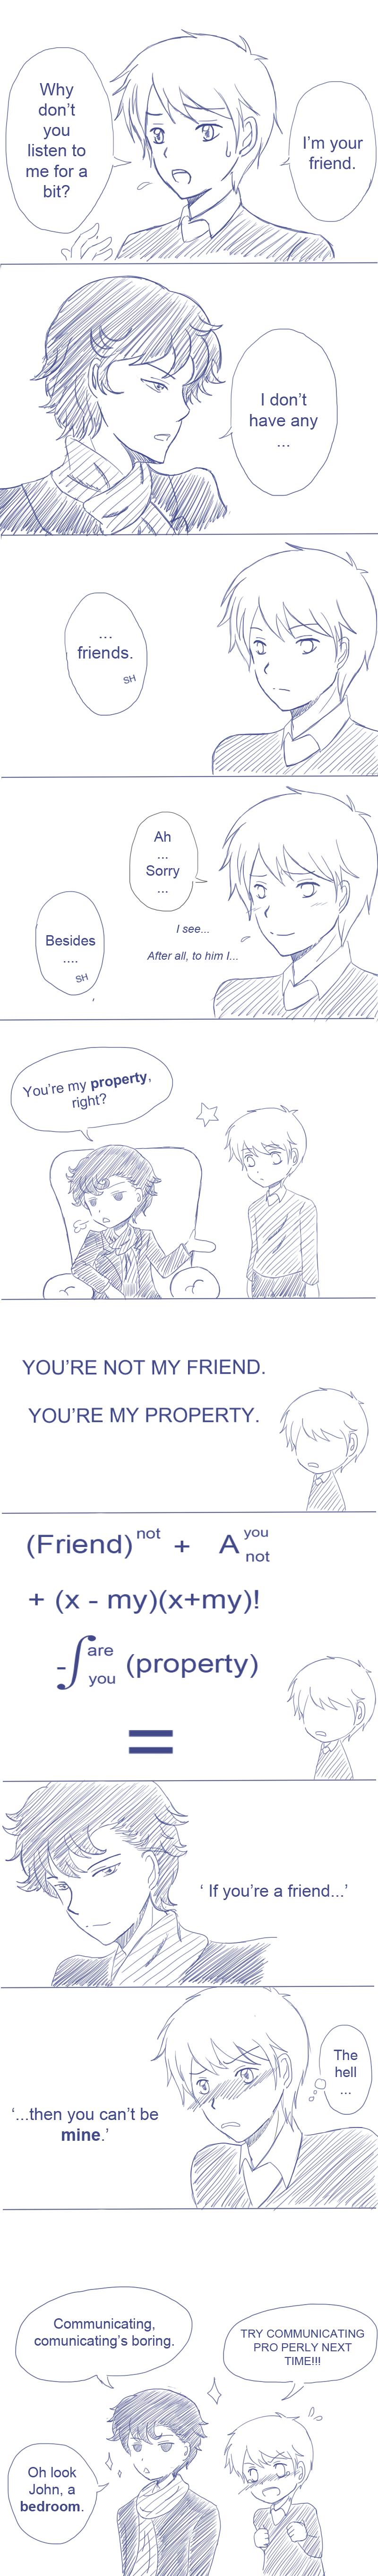 Not a friend by Voidance-kun